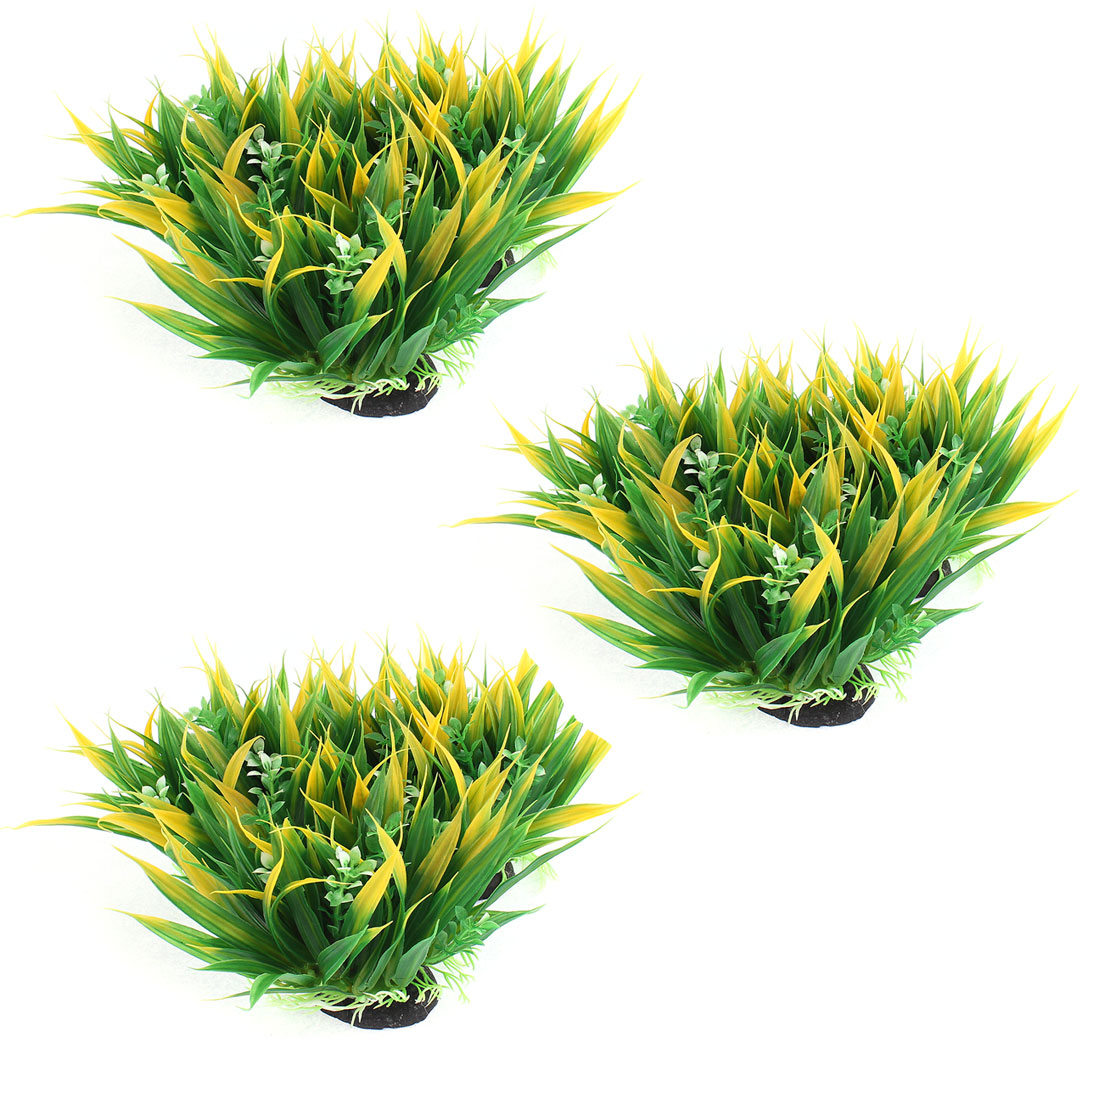 Fishtank Aquarium Ceramic Base Manmade Plant Grass Yellow Green 3pcs